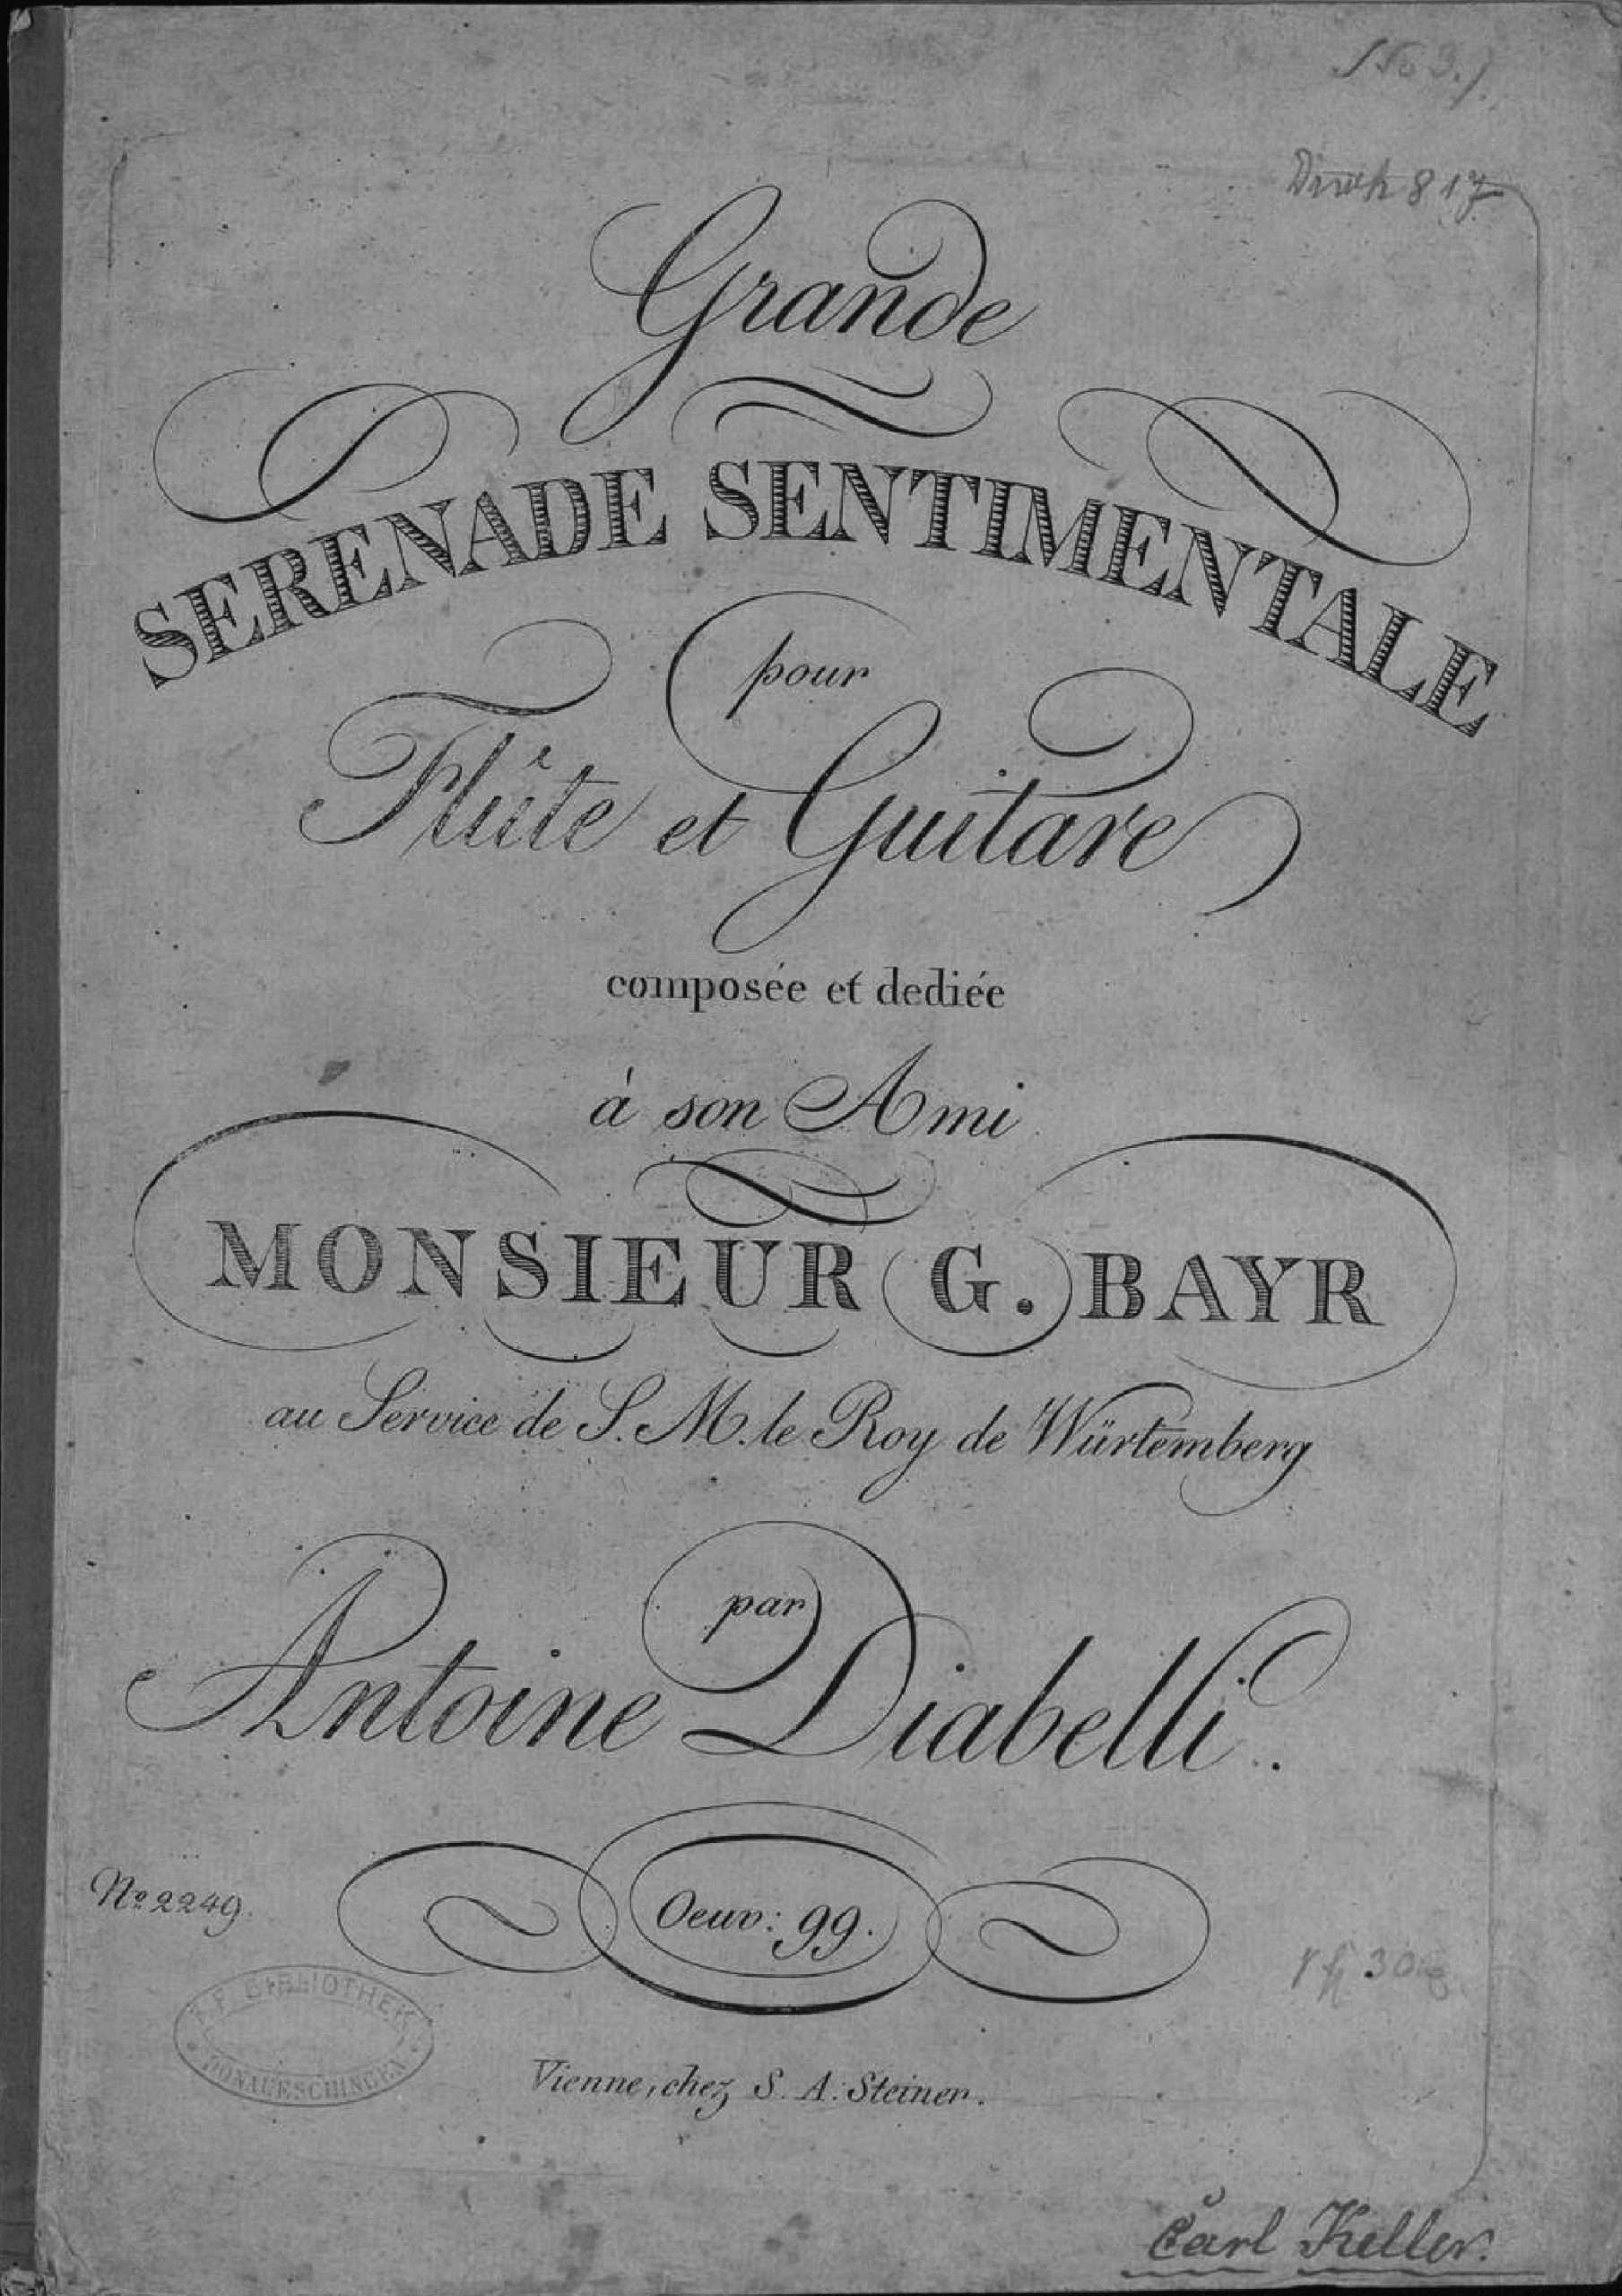 Diabelli, Anton - Grande Serenade sentimentale pour Flute et Guitare, Op.99